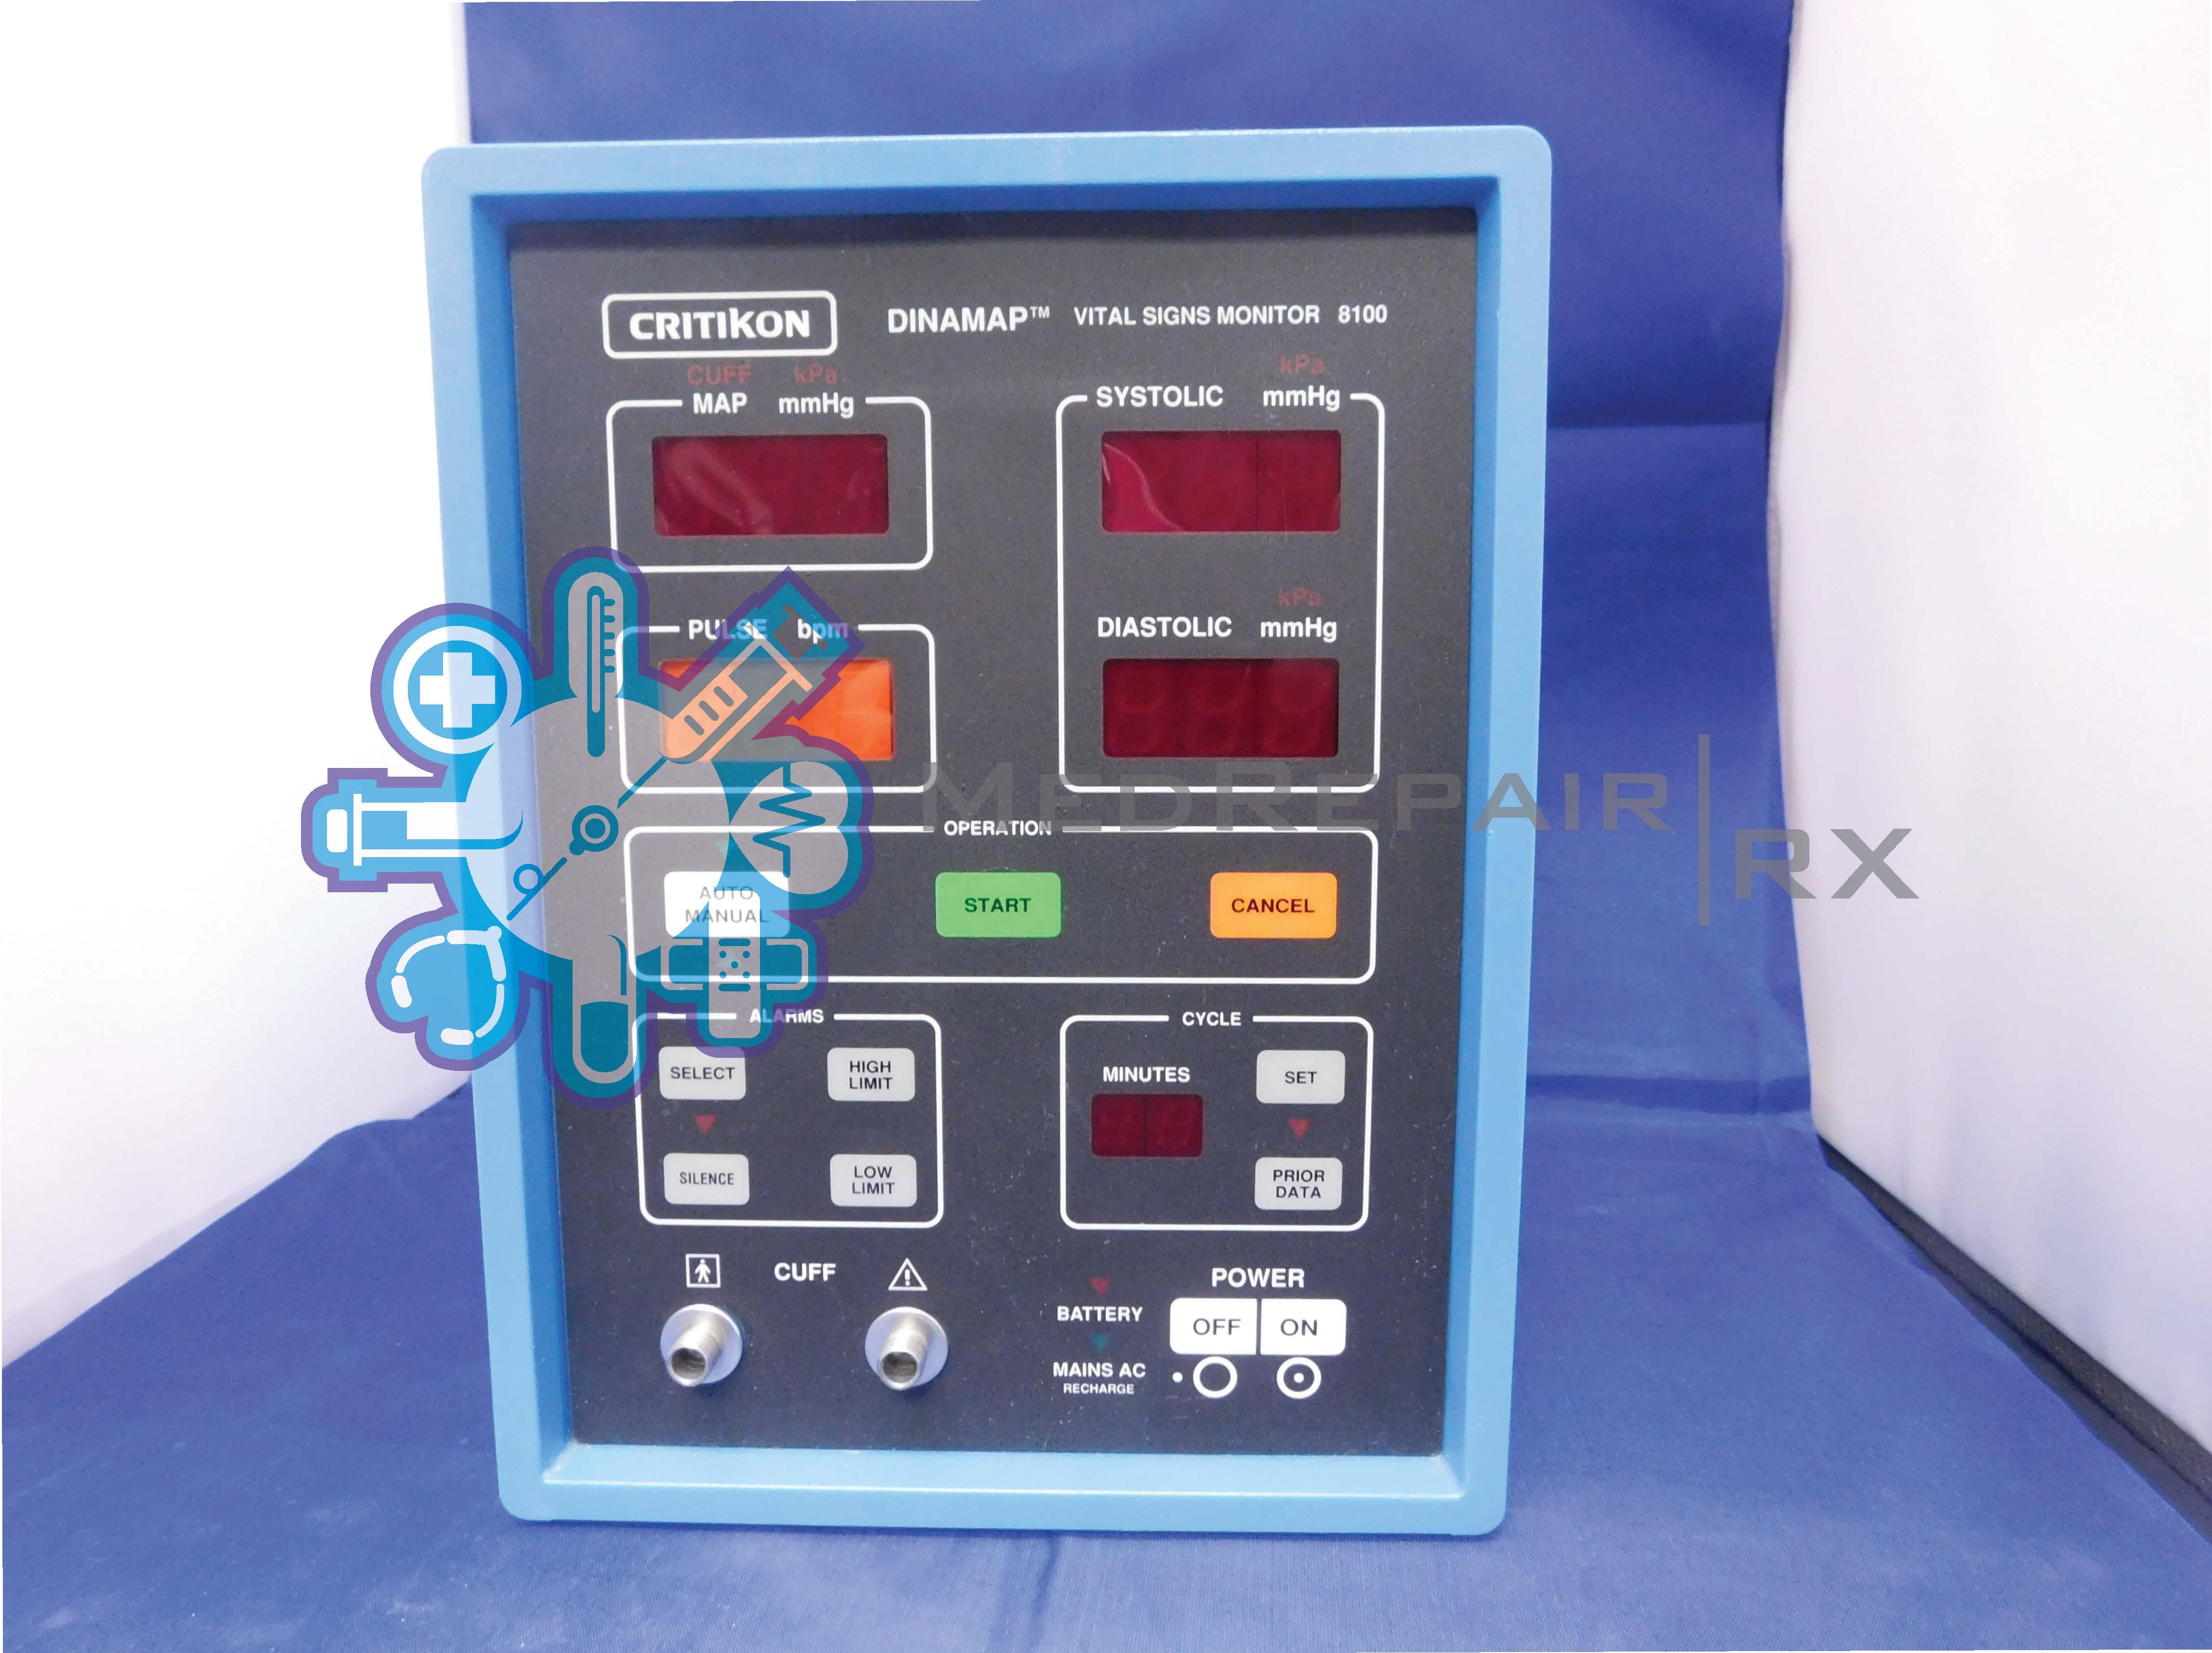 Critikon Dinamap Vital Signs Monitor 8100 : MedRepair Rx, LLC on